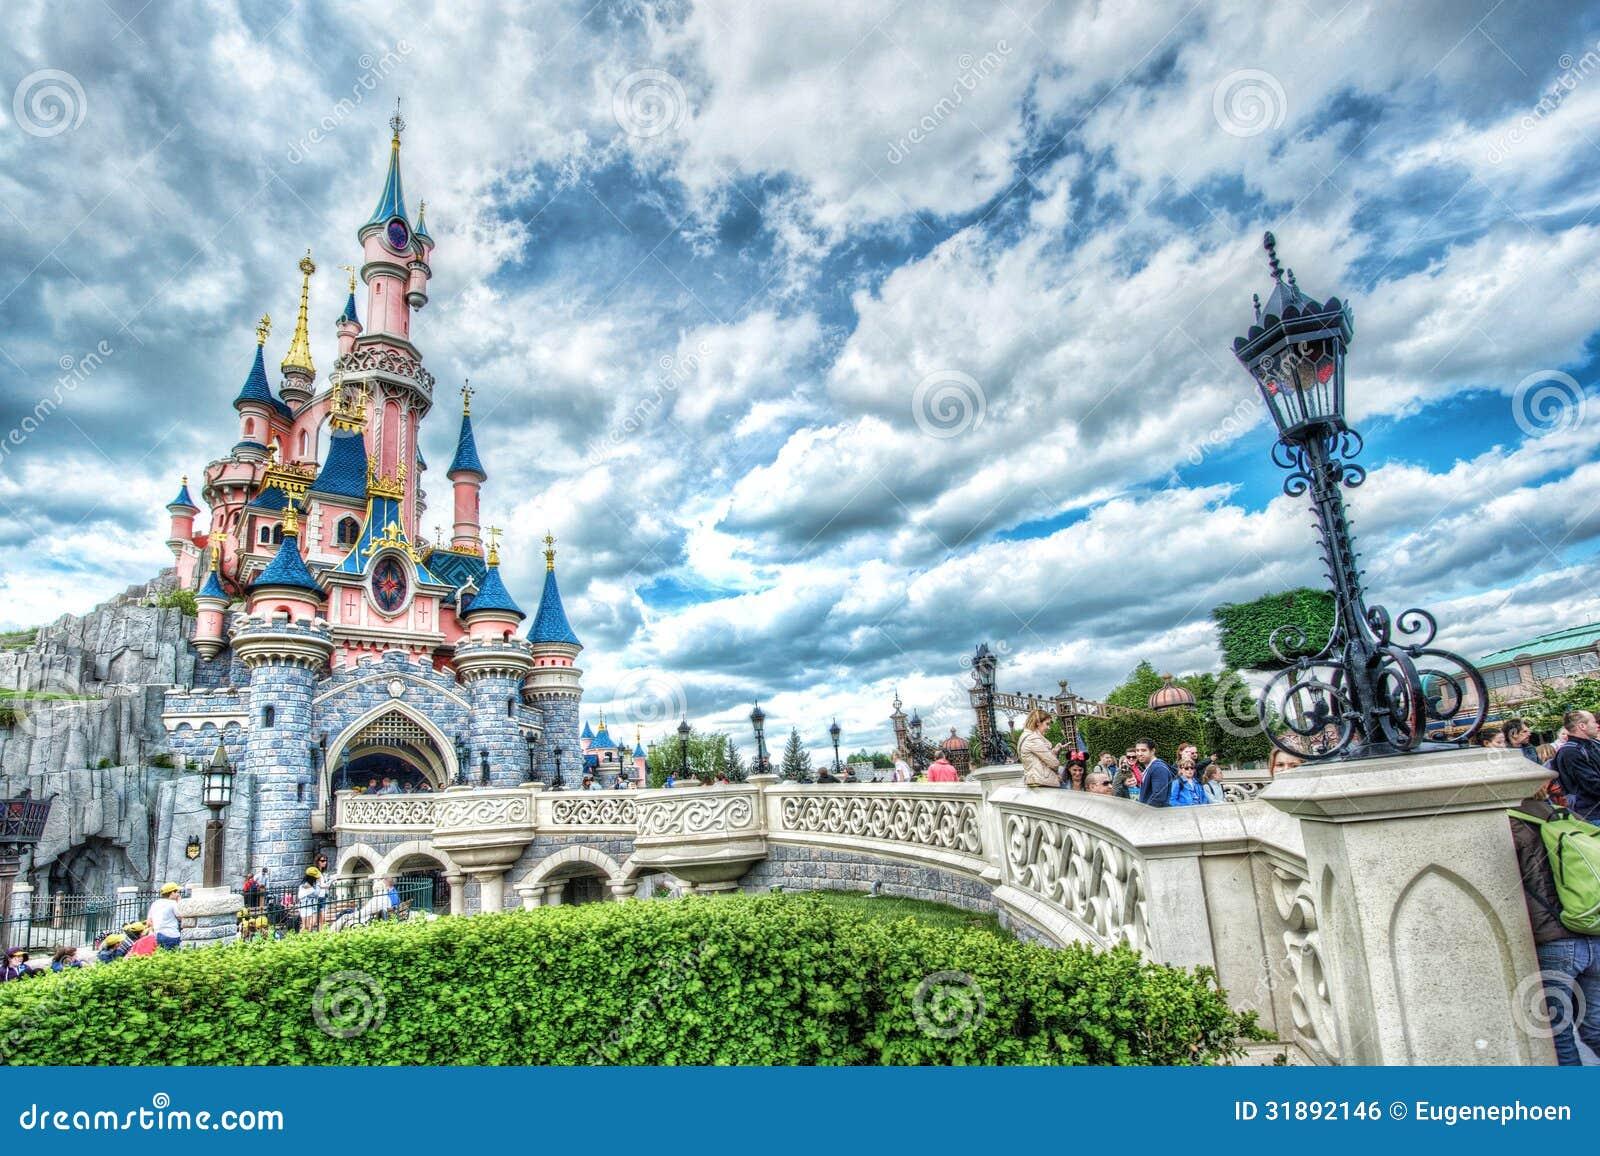 Fairytale Castle in France